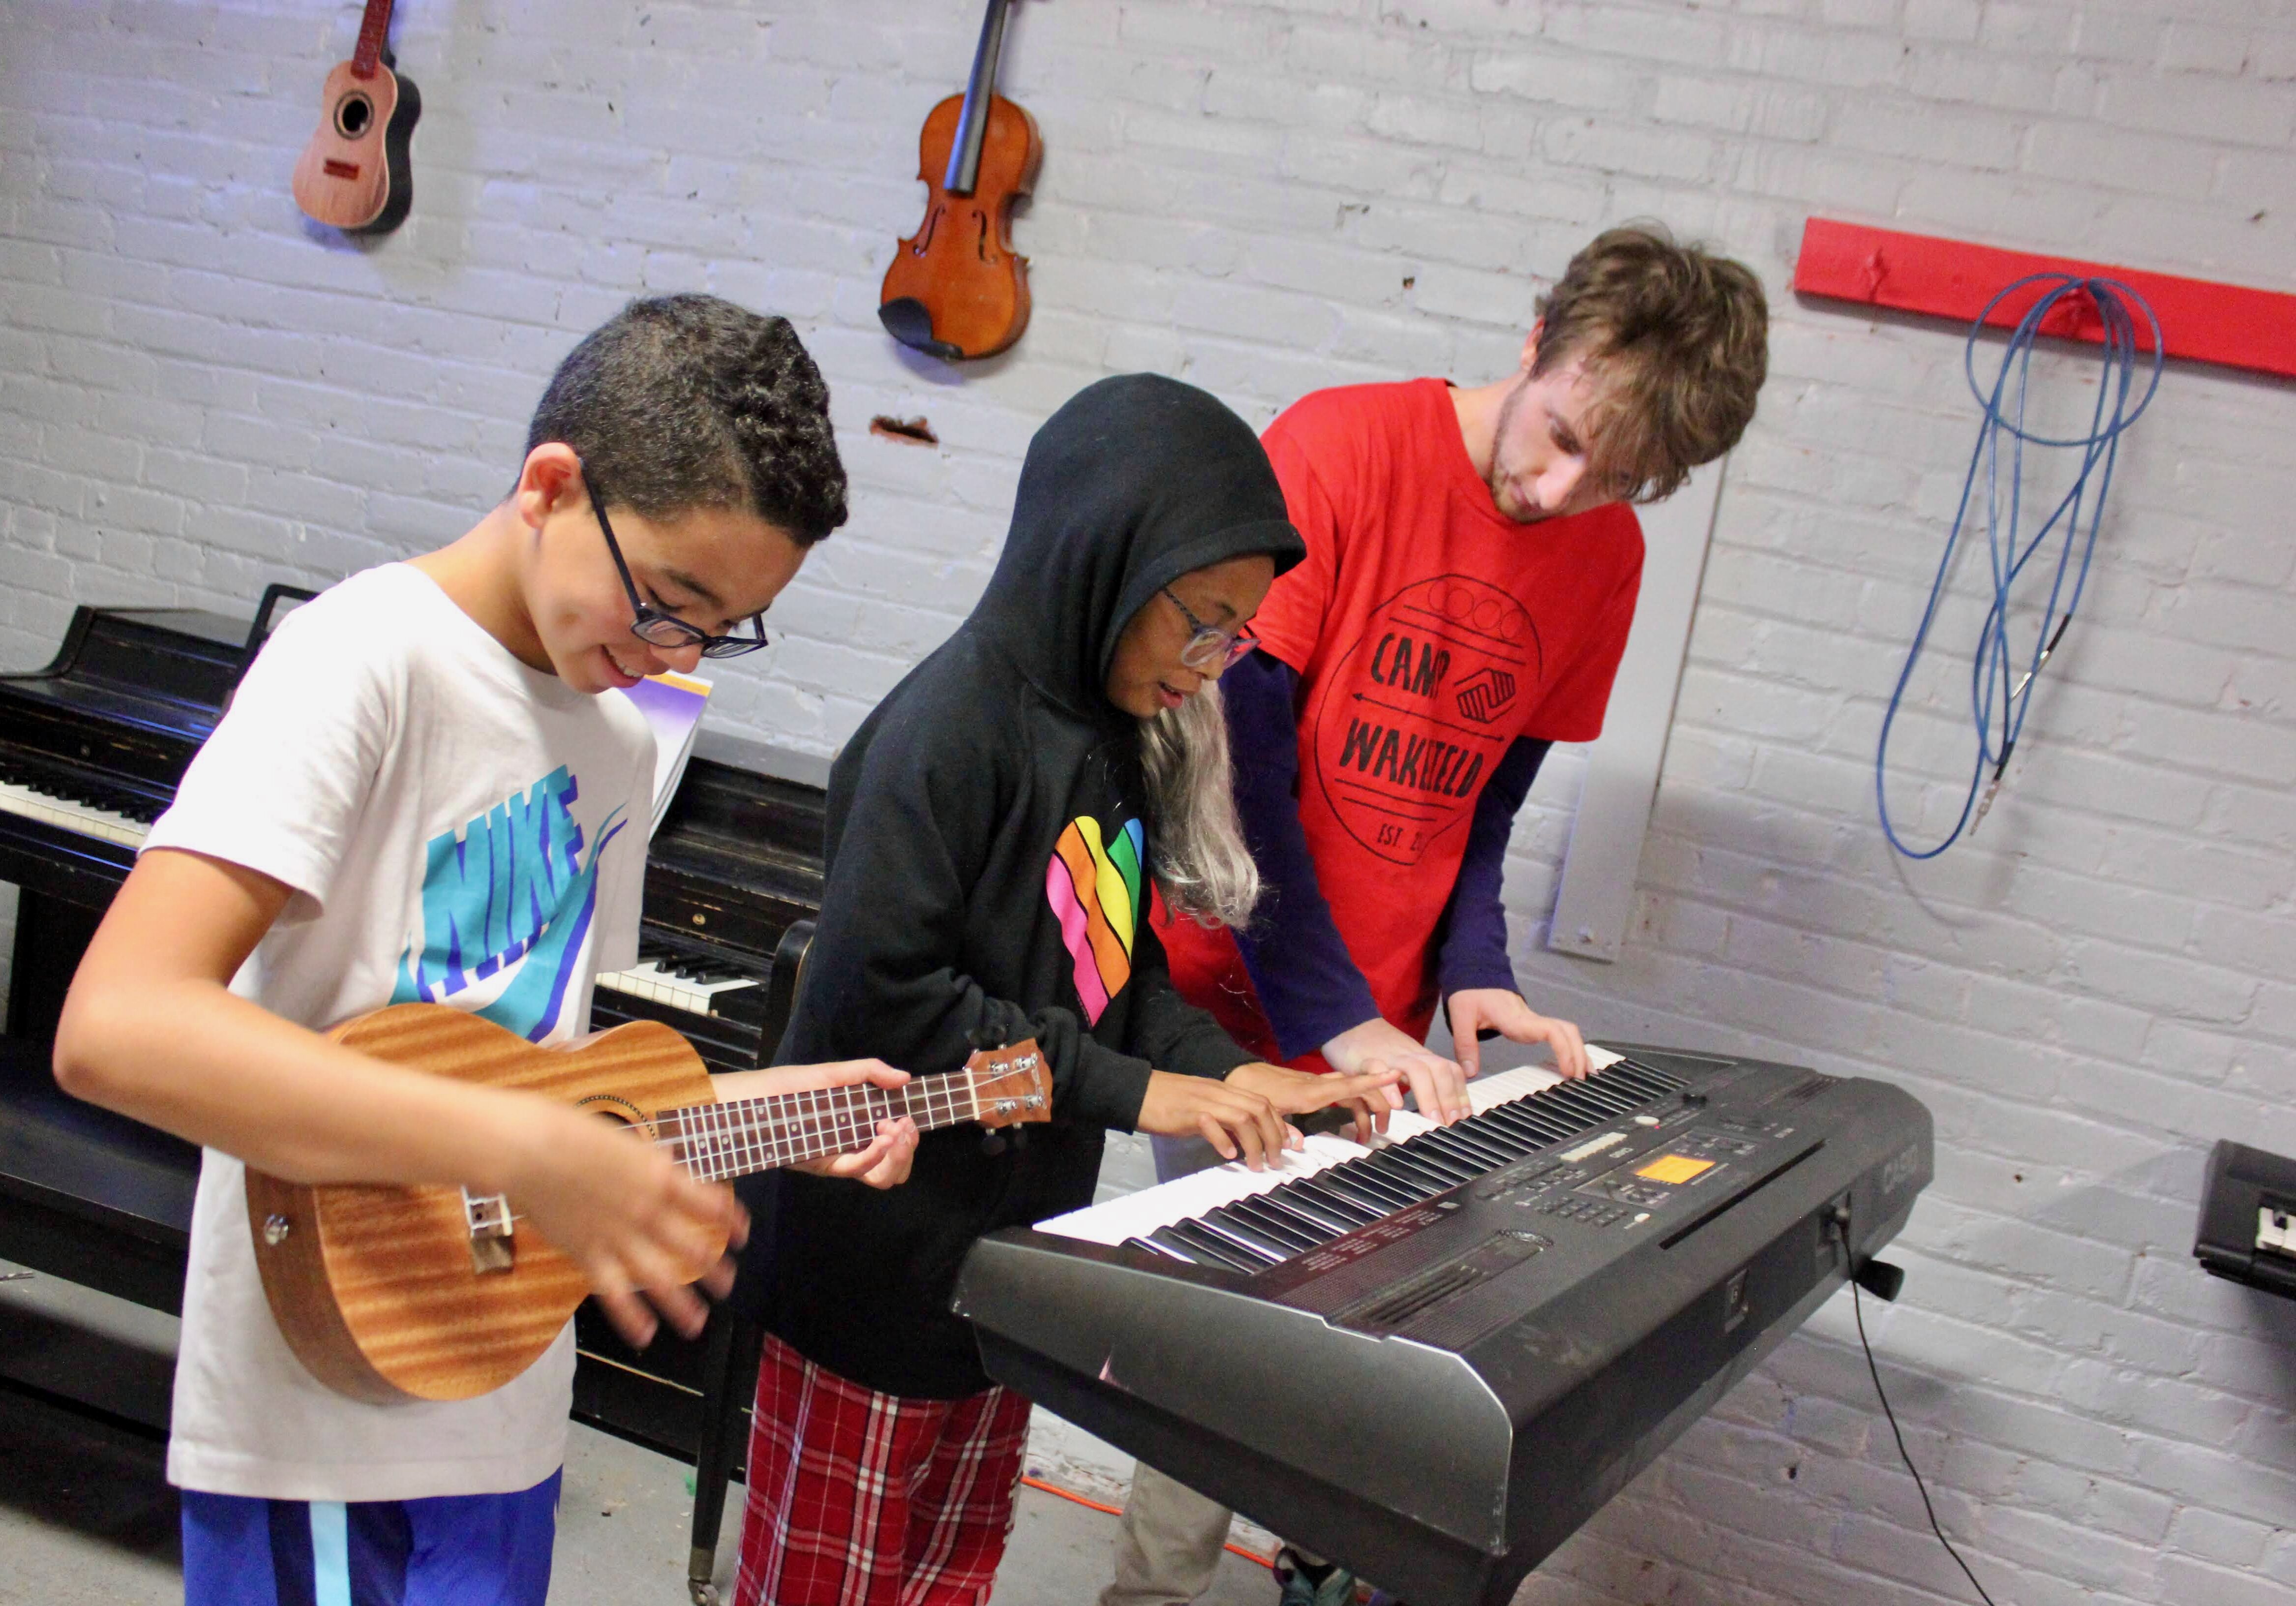 Boys playing music